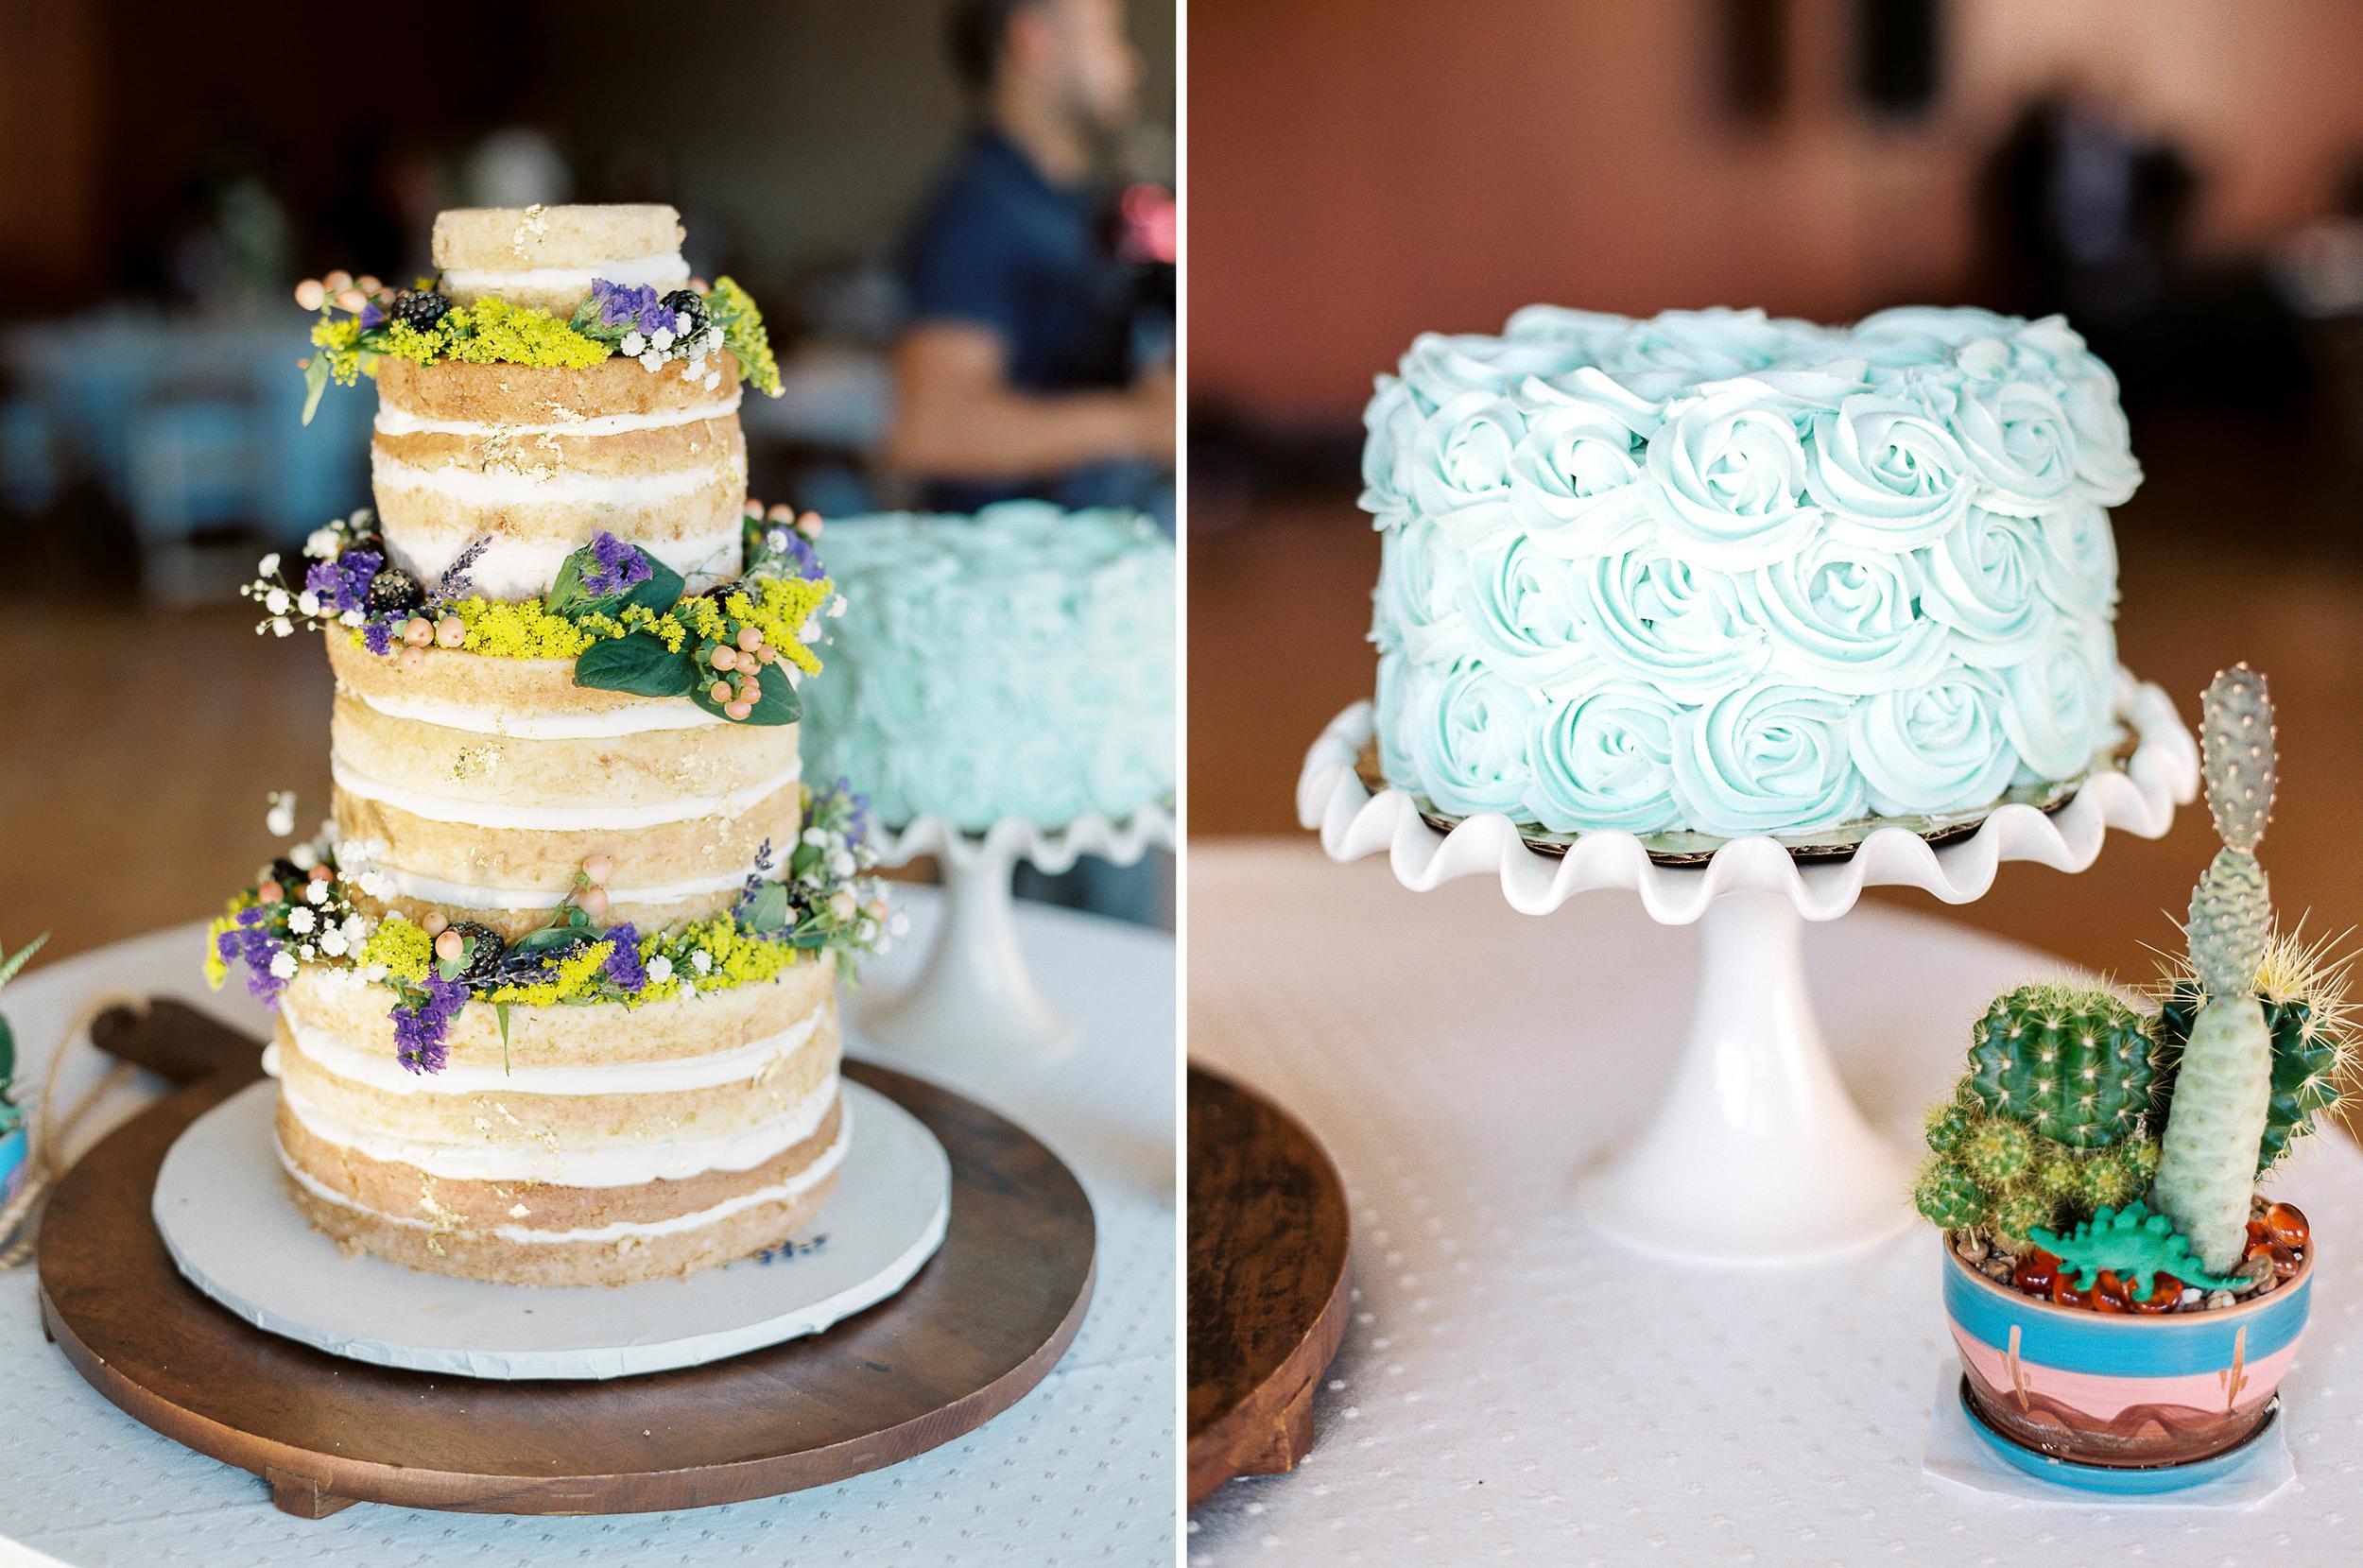 Dana-Fernandez-Photography-Martha-Stewart-Weddings-Houston-Texas-Wedding-Photographer-Film-129.jpg